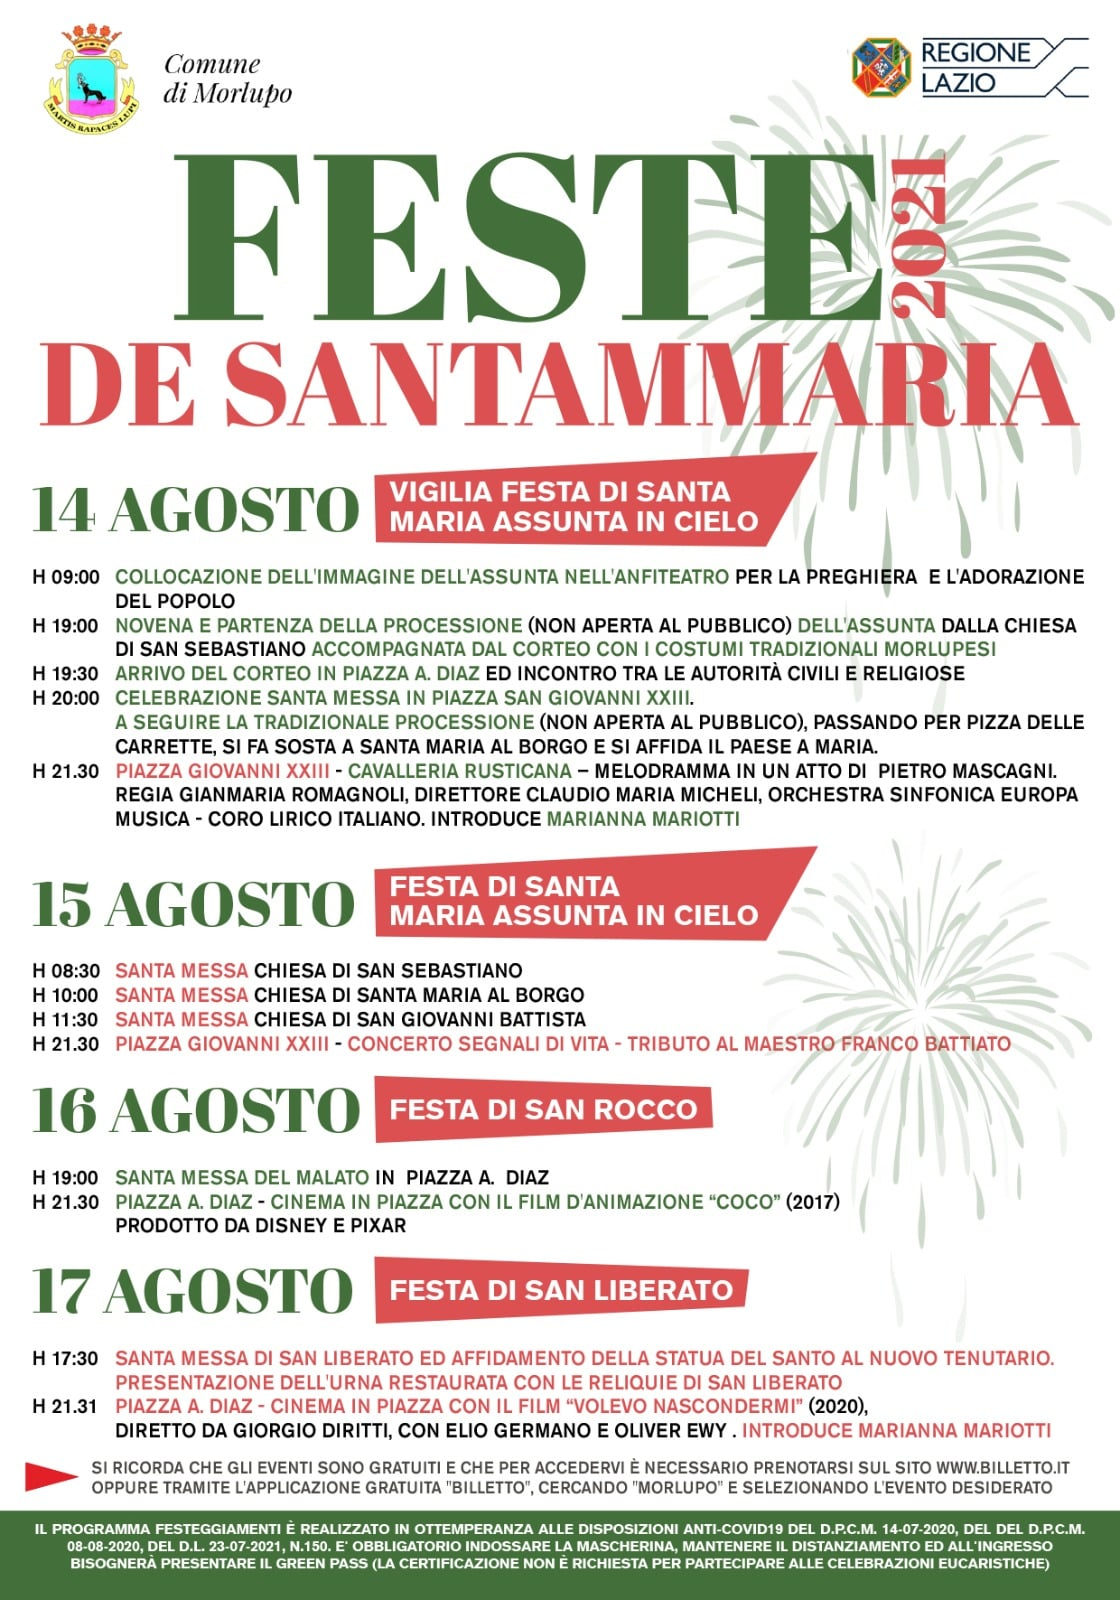 MORLUPO (RM): Feste di Santammaria 2021